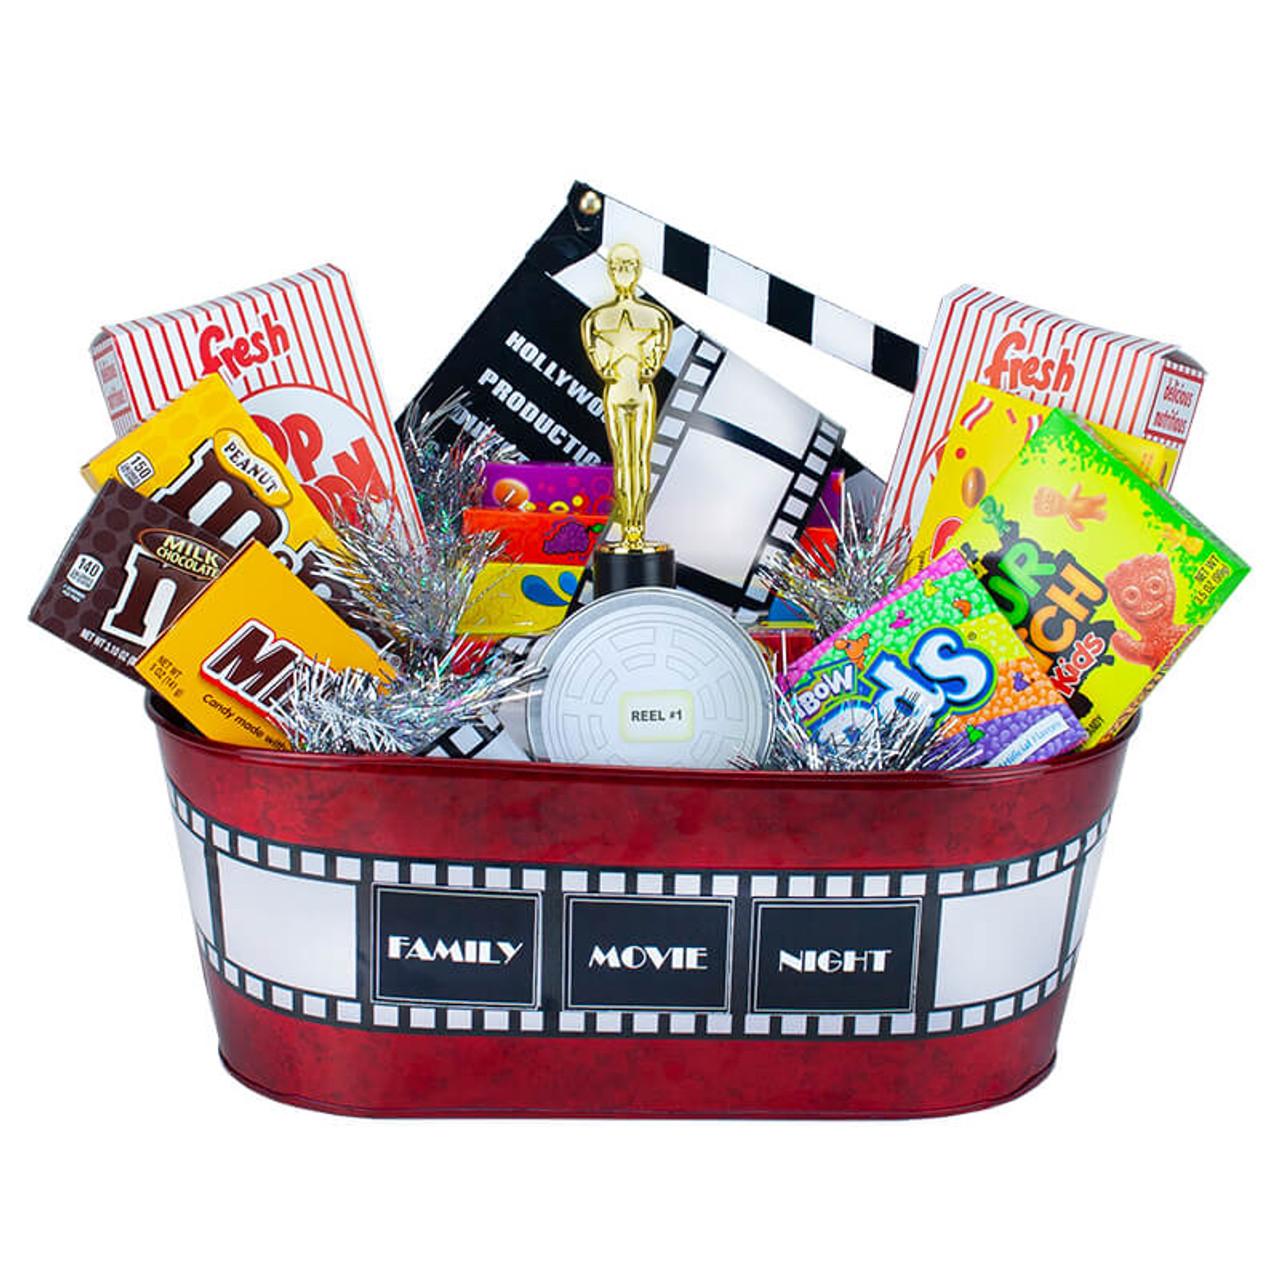 Family Movie Night Gift Basket